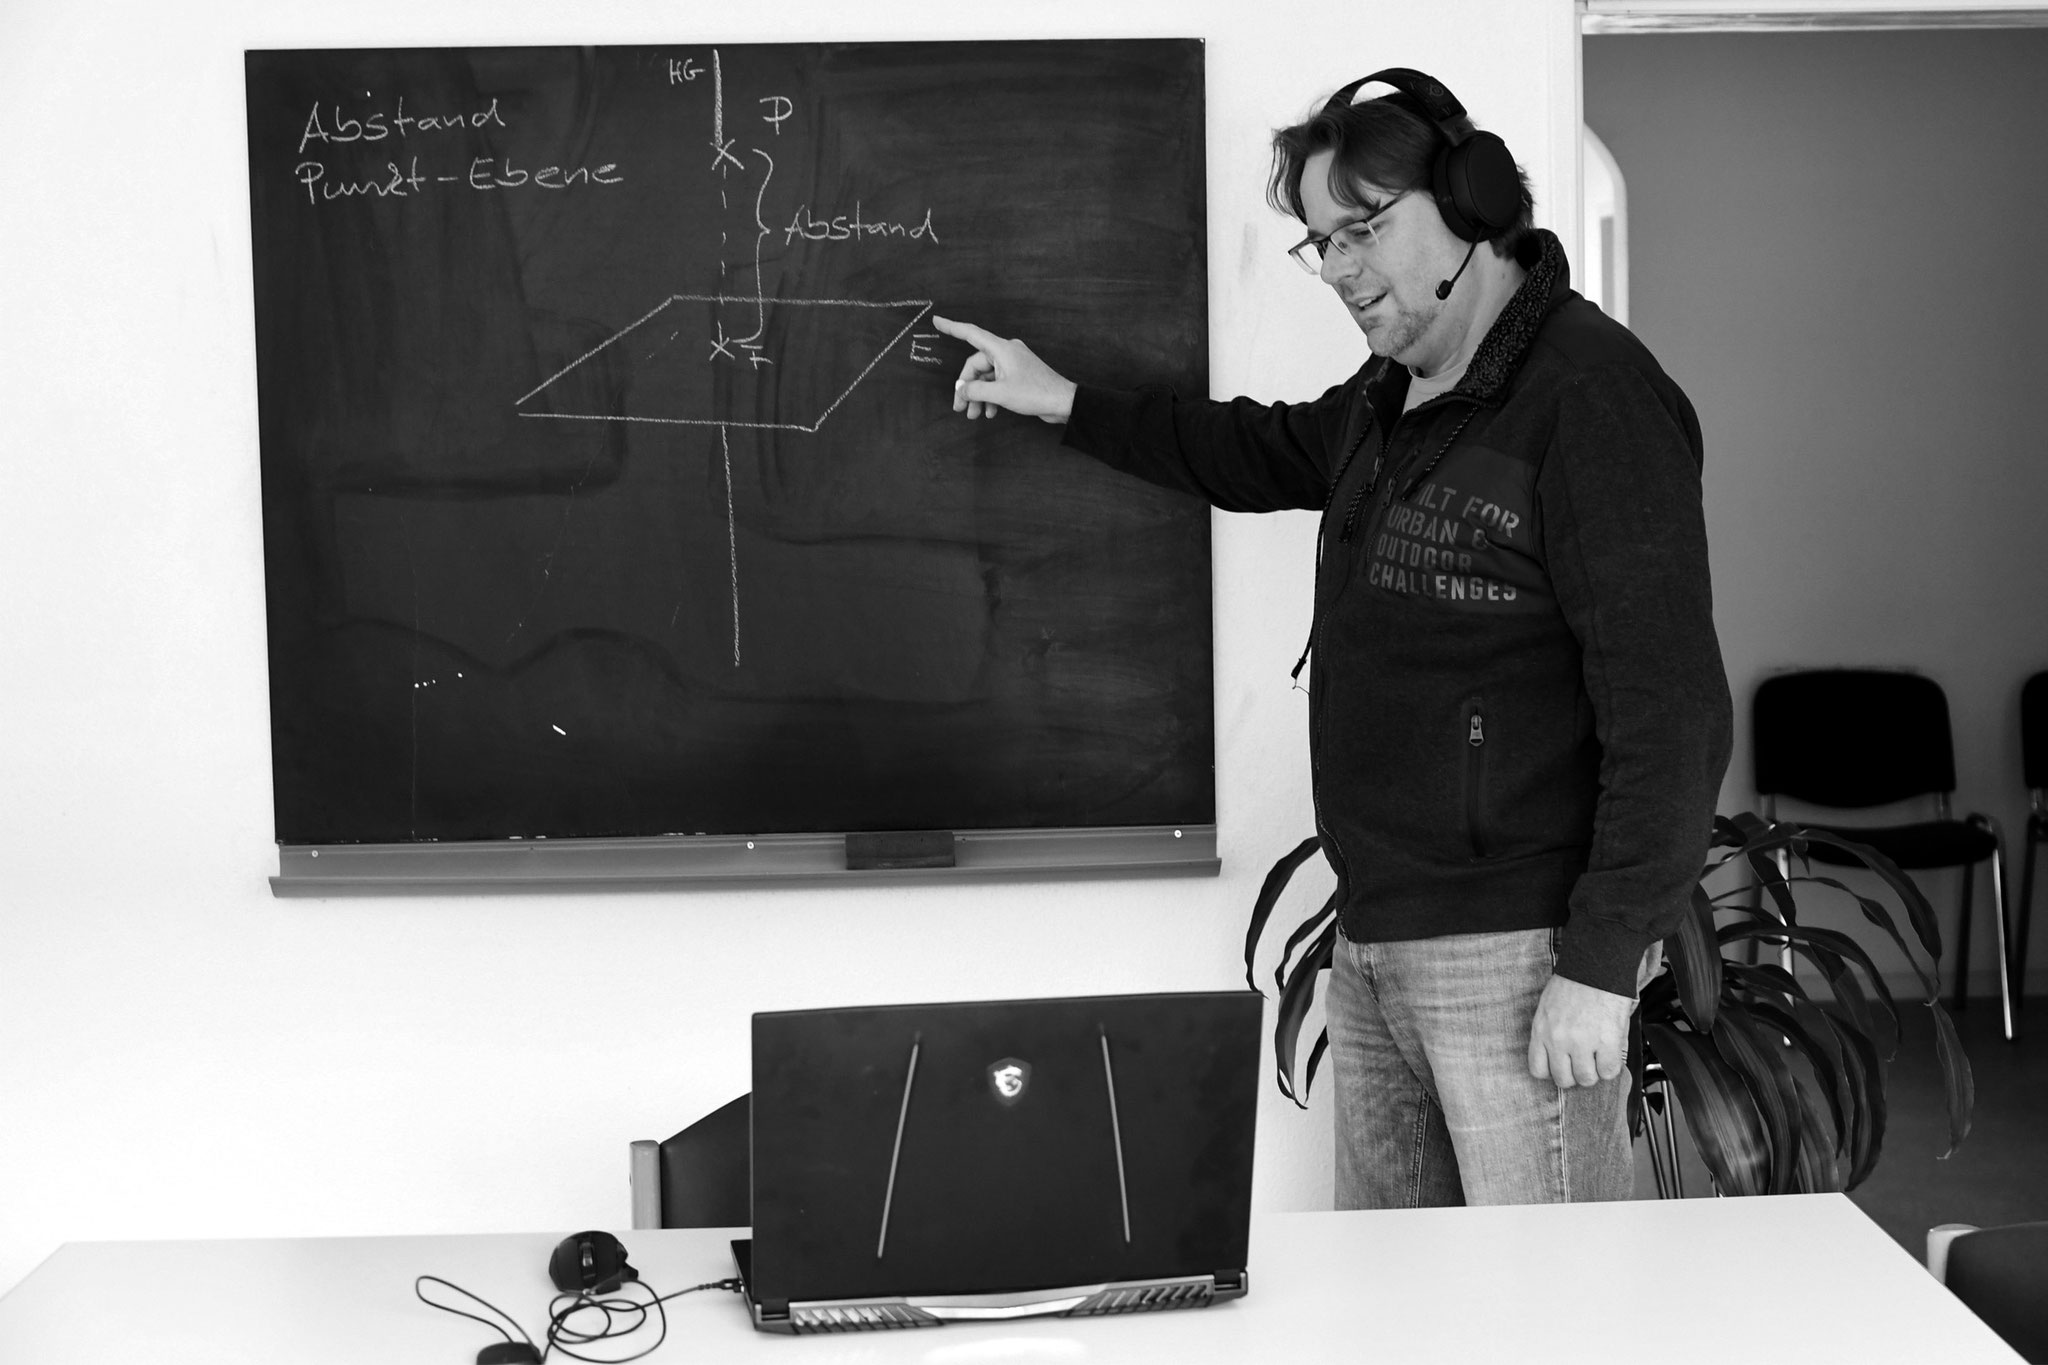 18.3.2020 | FT | Lernstudio Capito | Mathematikunterricht über Skype